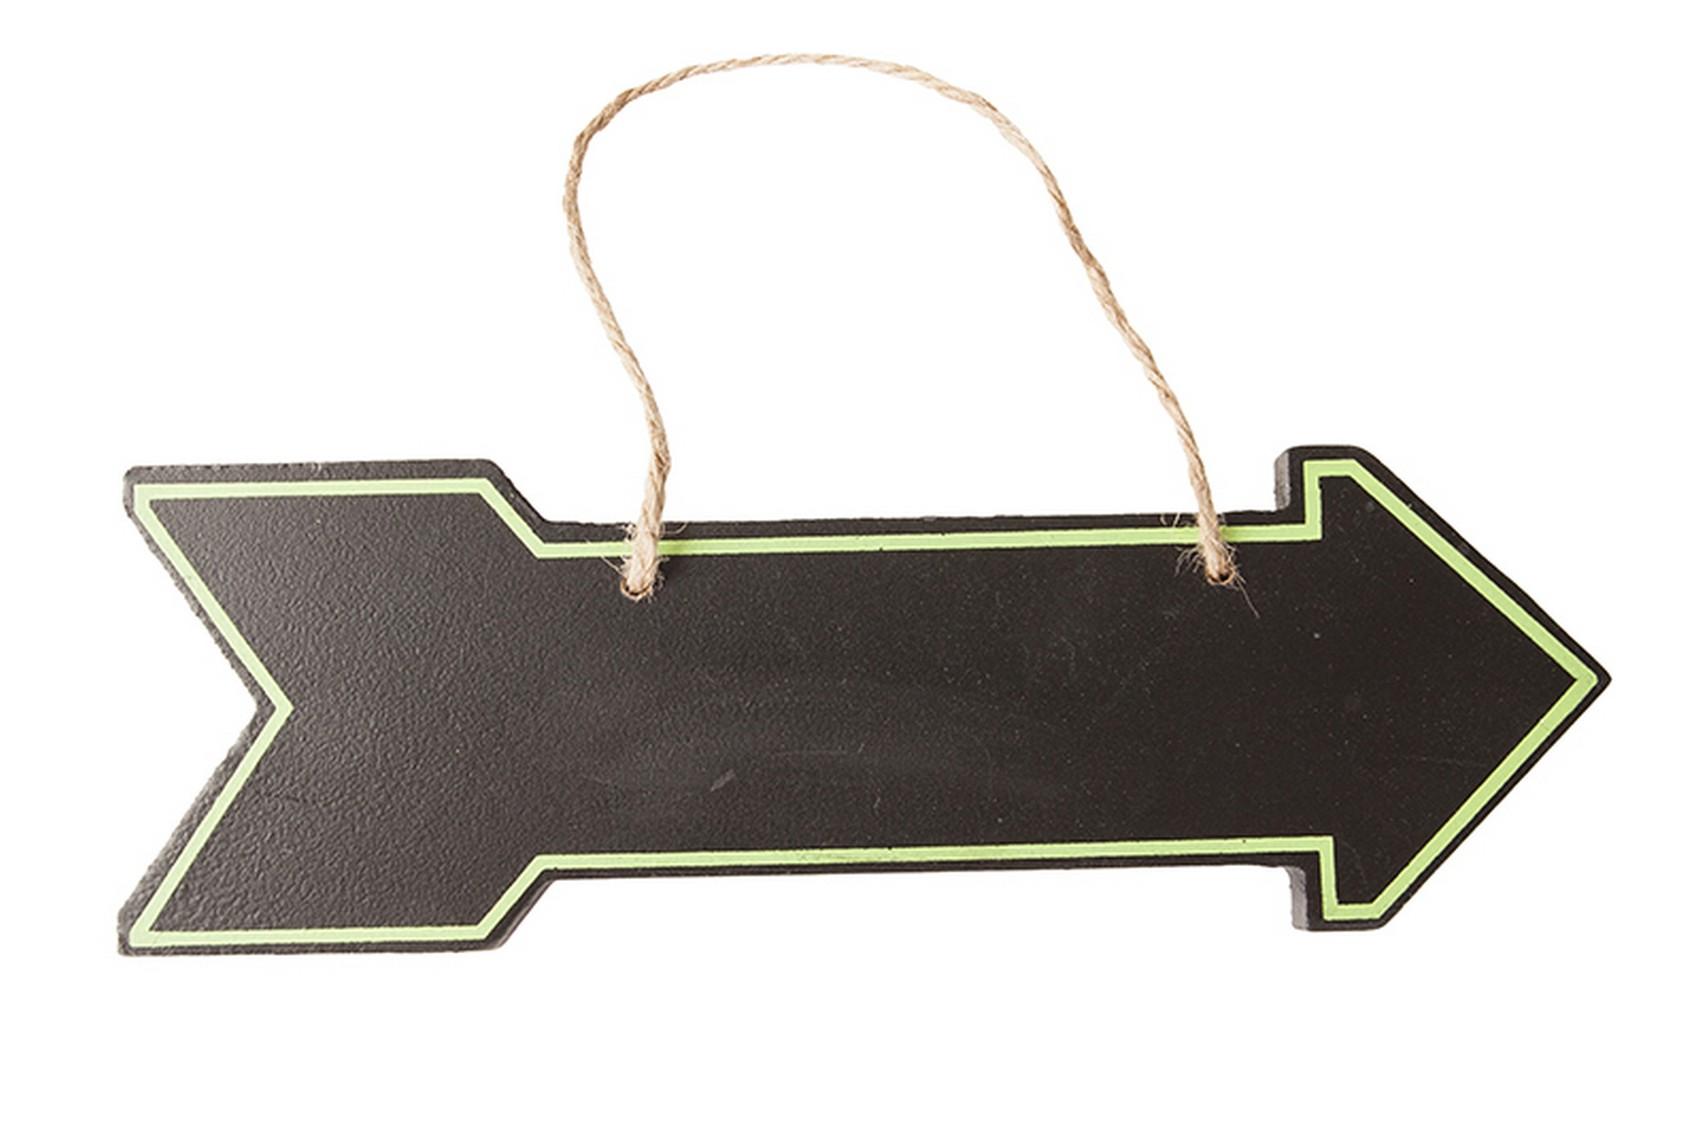 Hanging Wood Chalkboard Arrow Sign, Black, 12-Inch ...  |Chalkboard Arrow Sign Plant